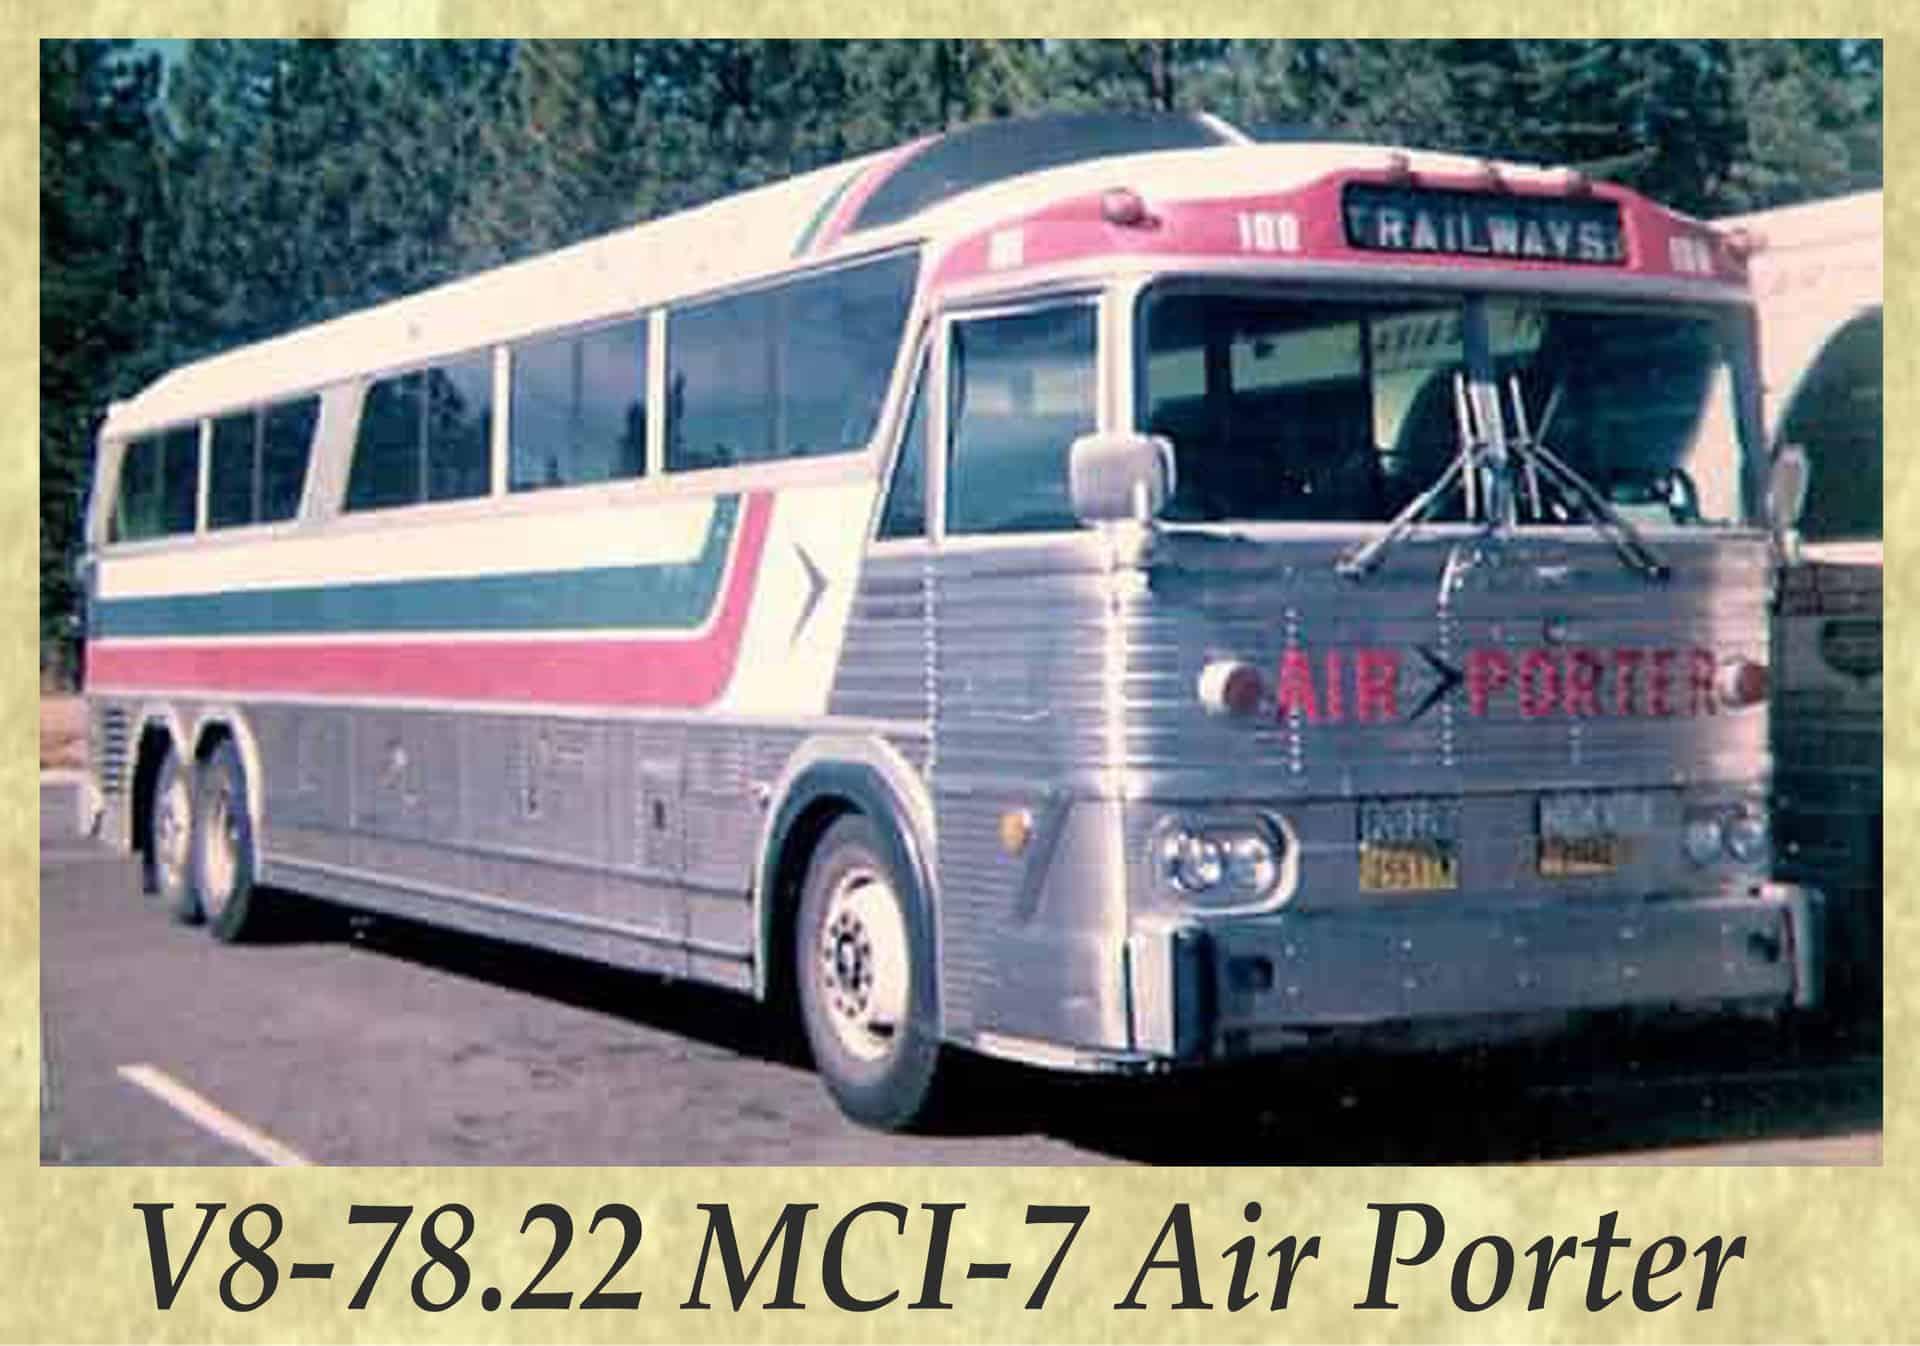 V8-78.22 MCI-7 Air Porter